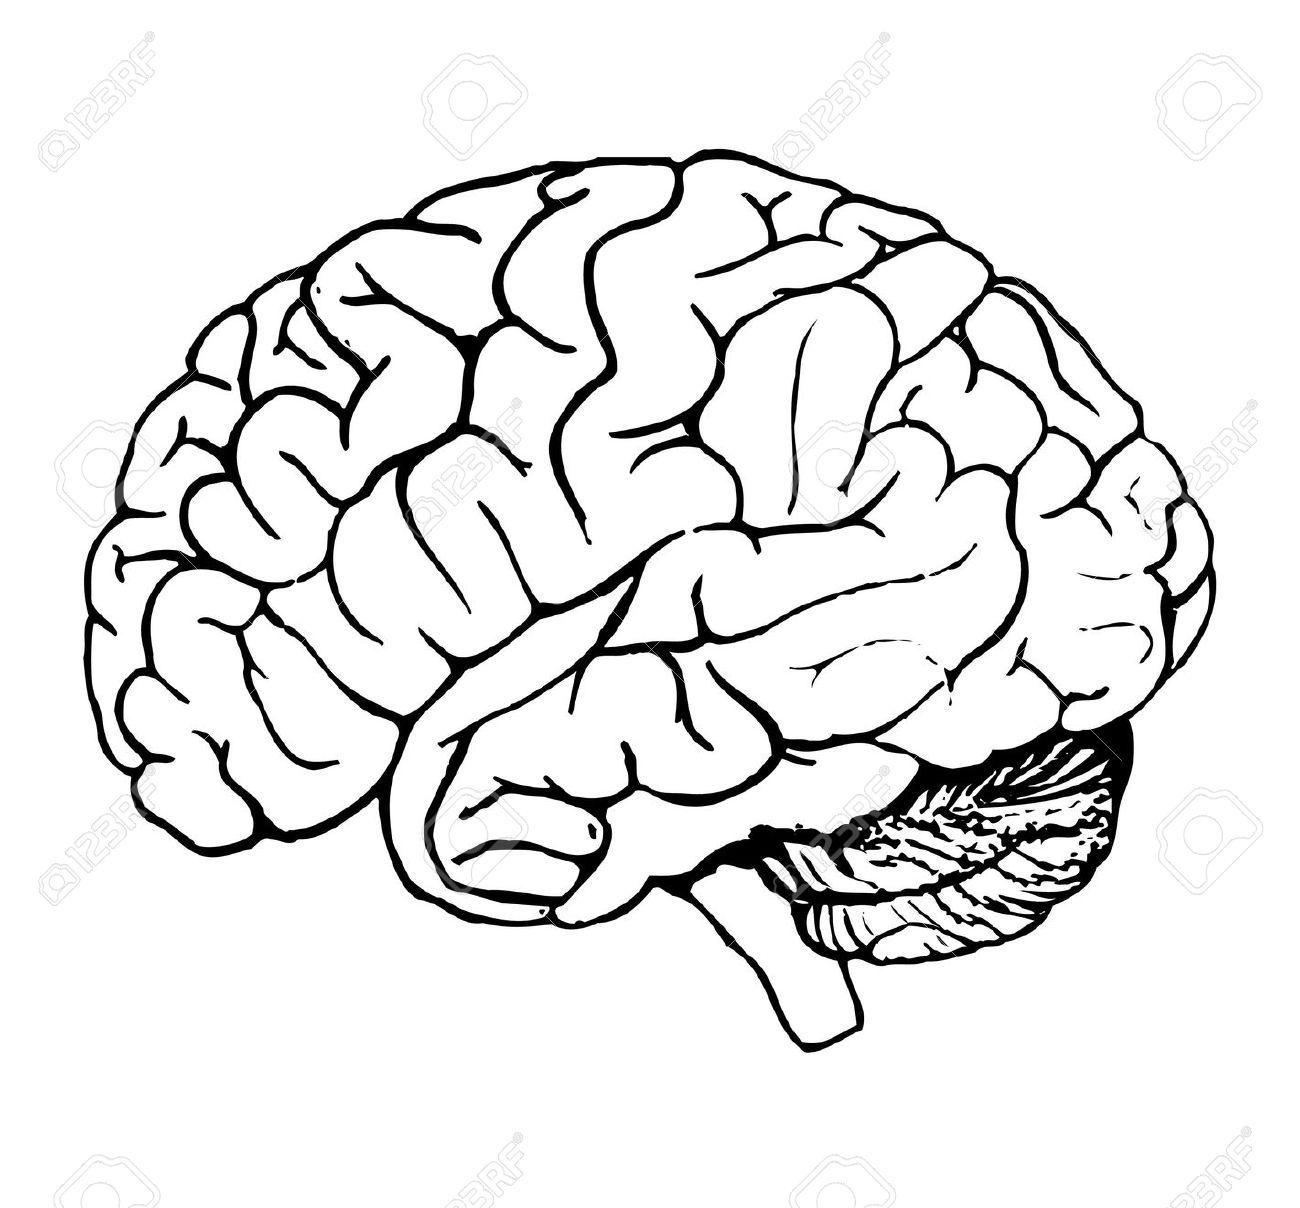 Clipart brain 1 » Clipart Station.